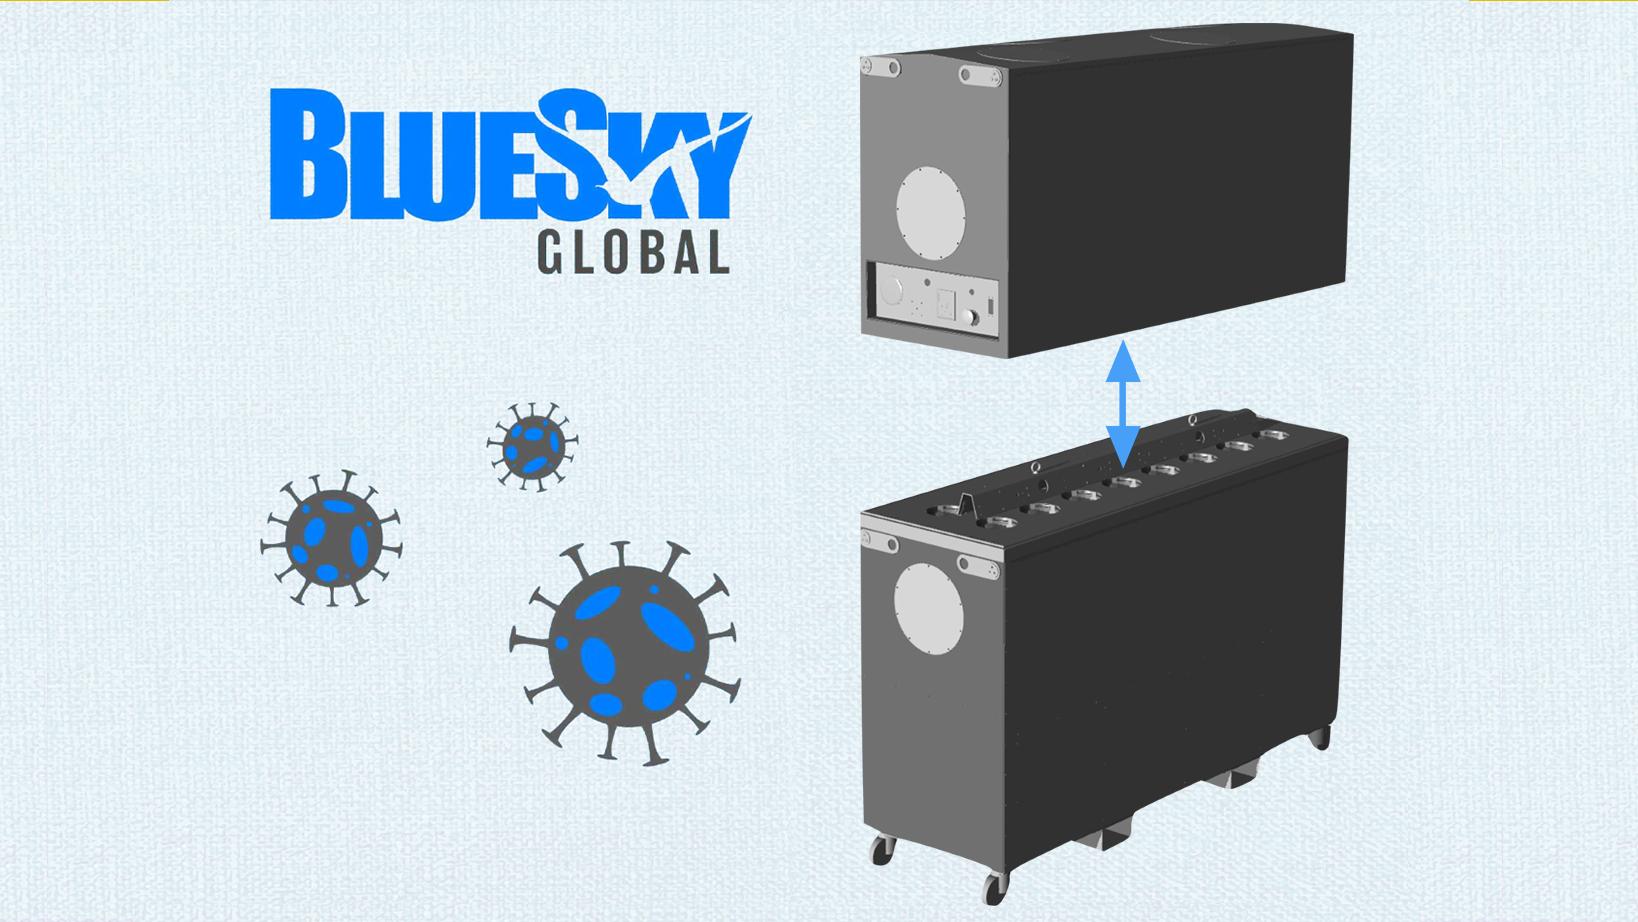 coronavirus-air-filtration-system-defender-50-separated--W